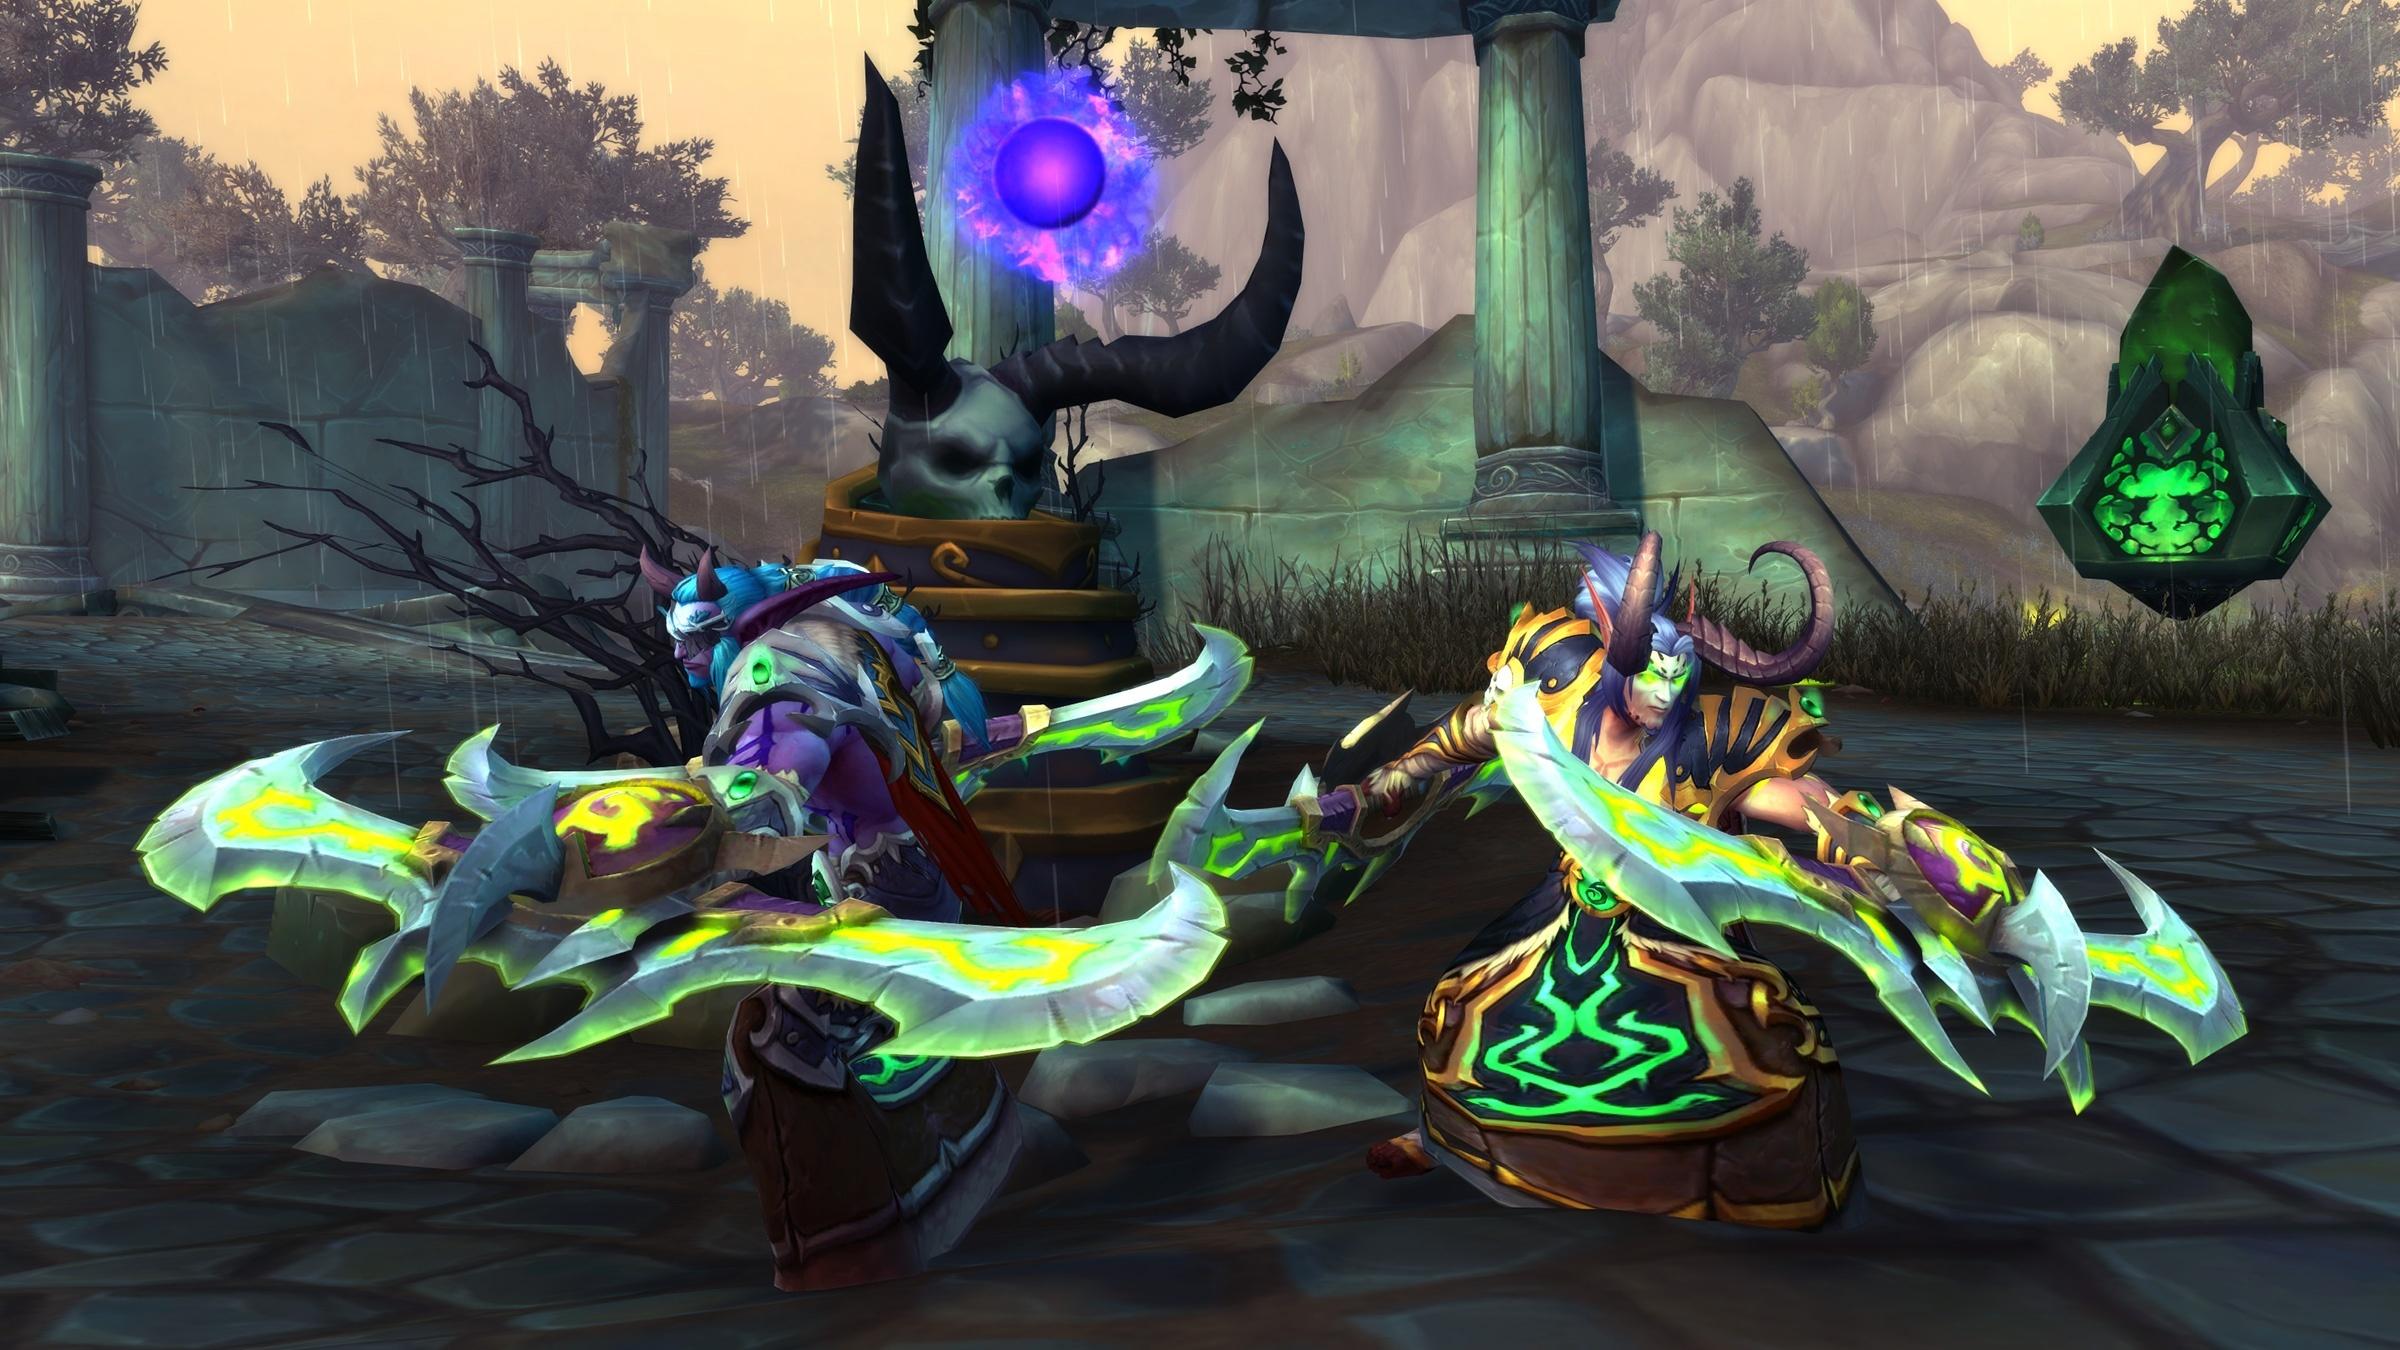 heroes 3 shadow of death artifact combinations